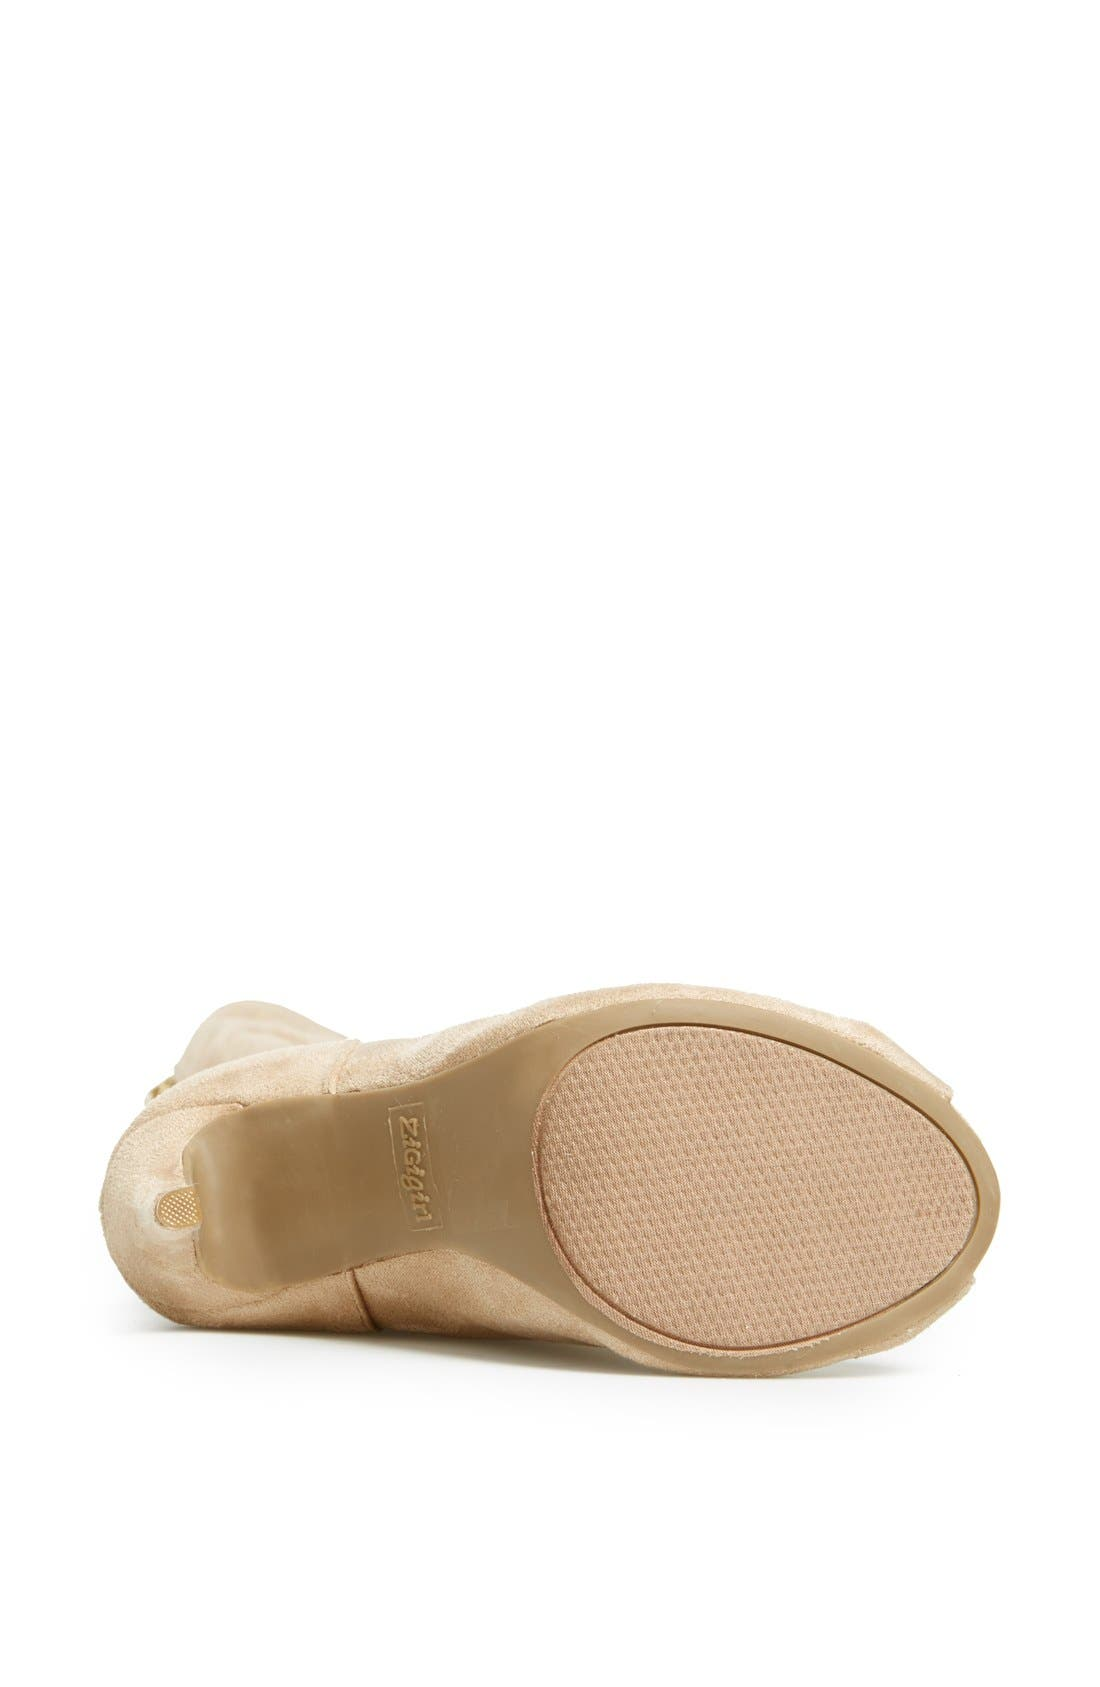 Alternate Image 4  - ZiGi girl 'Piarry' Lace-Up Thigh-High Boot (Narrow Calf)